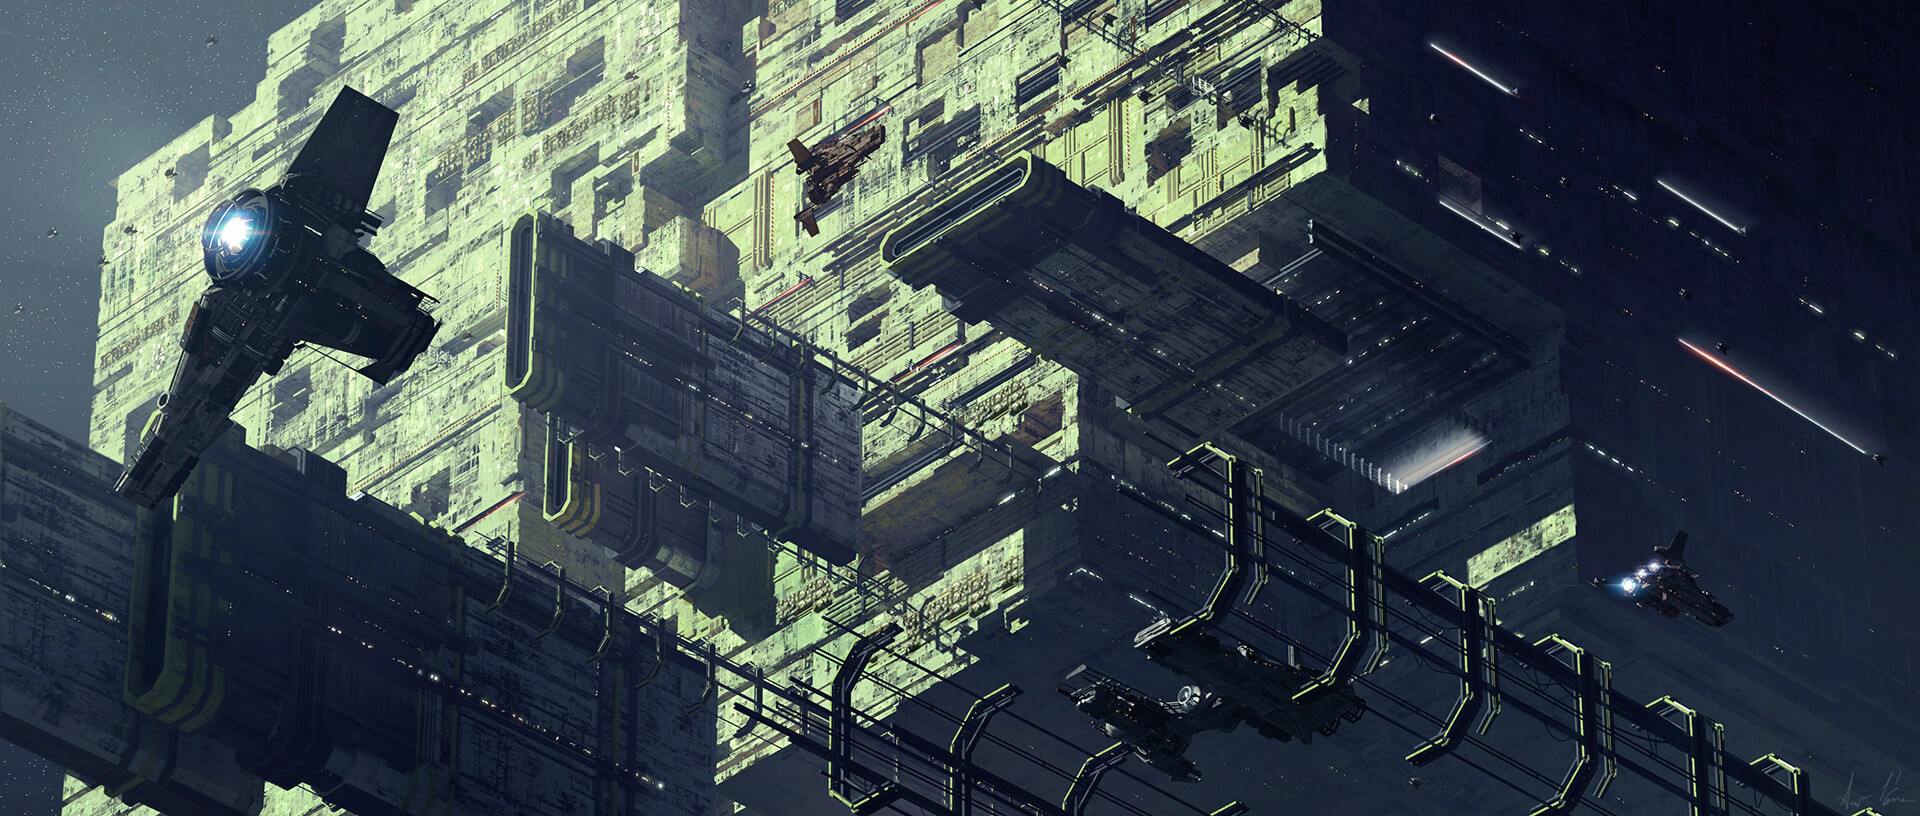 The Sci-Fi Concept Artwork of Kamen Anev